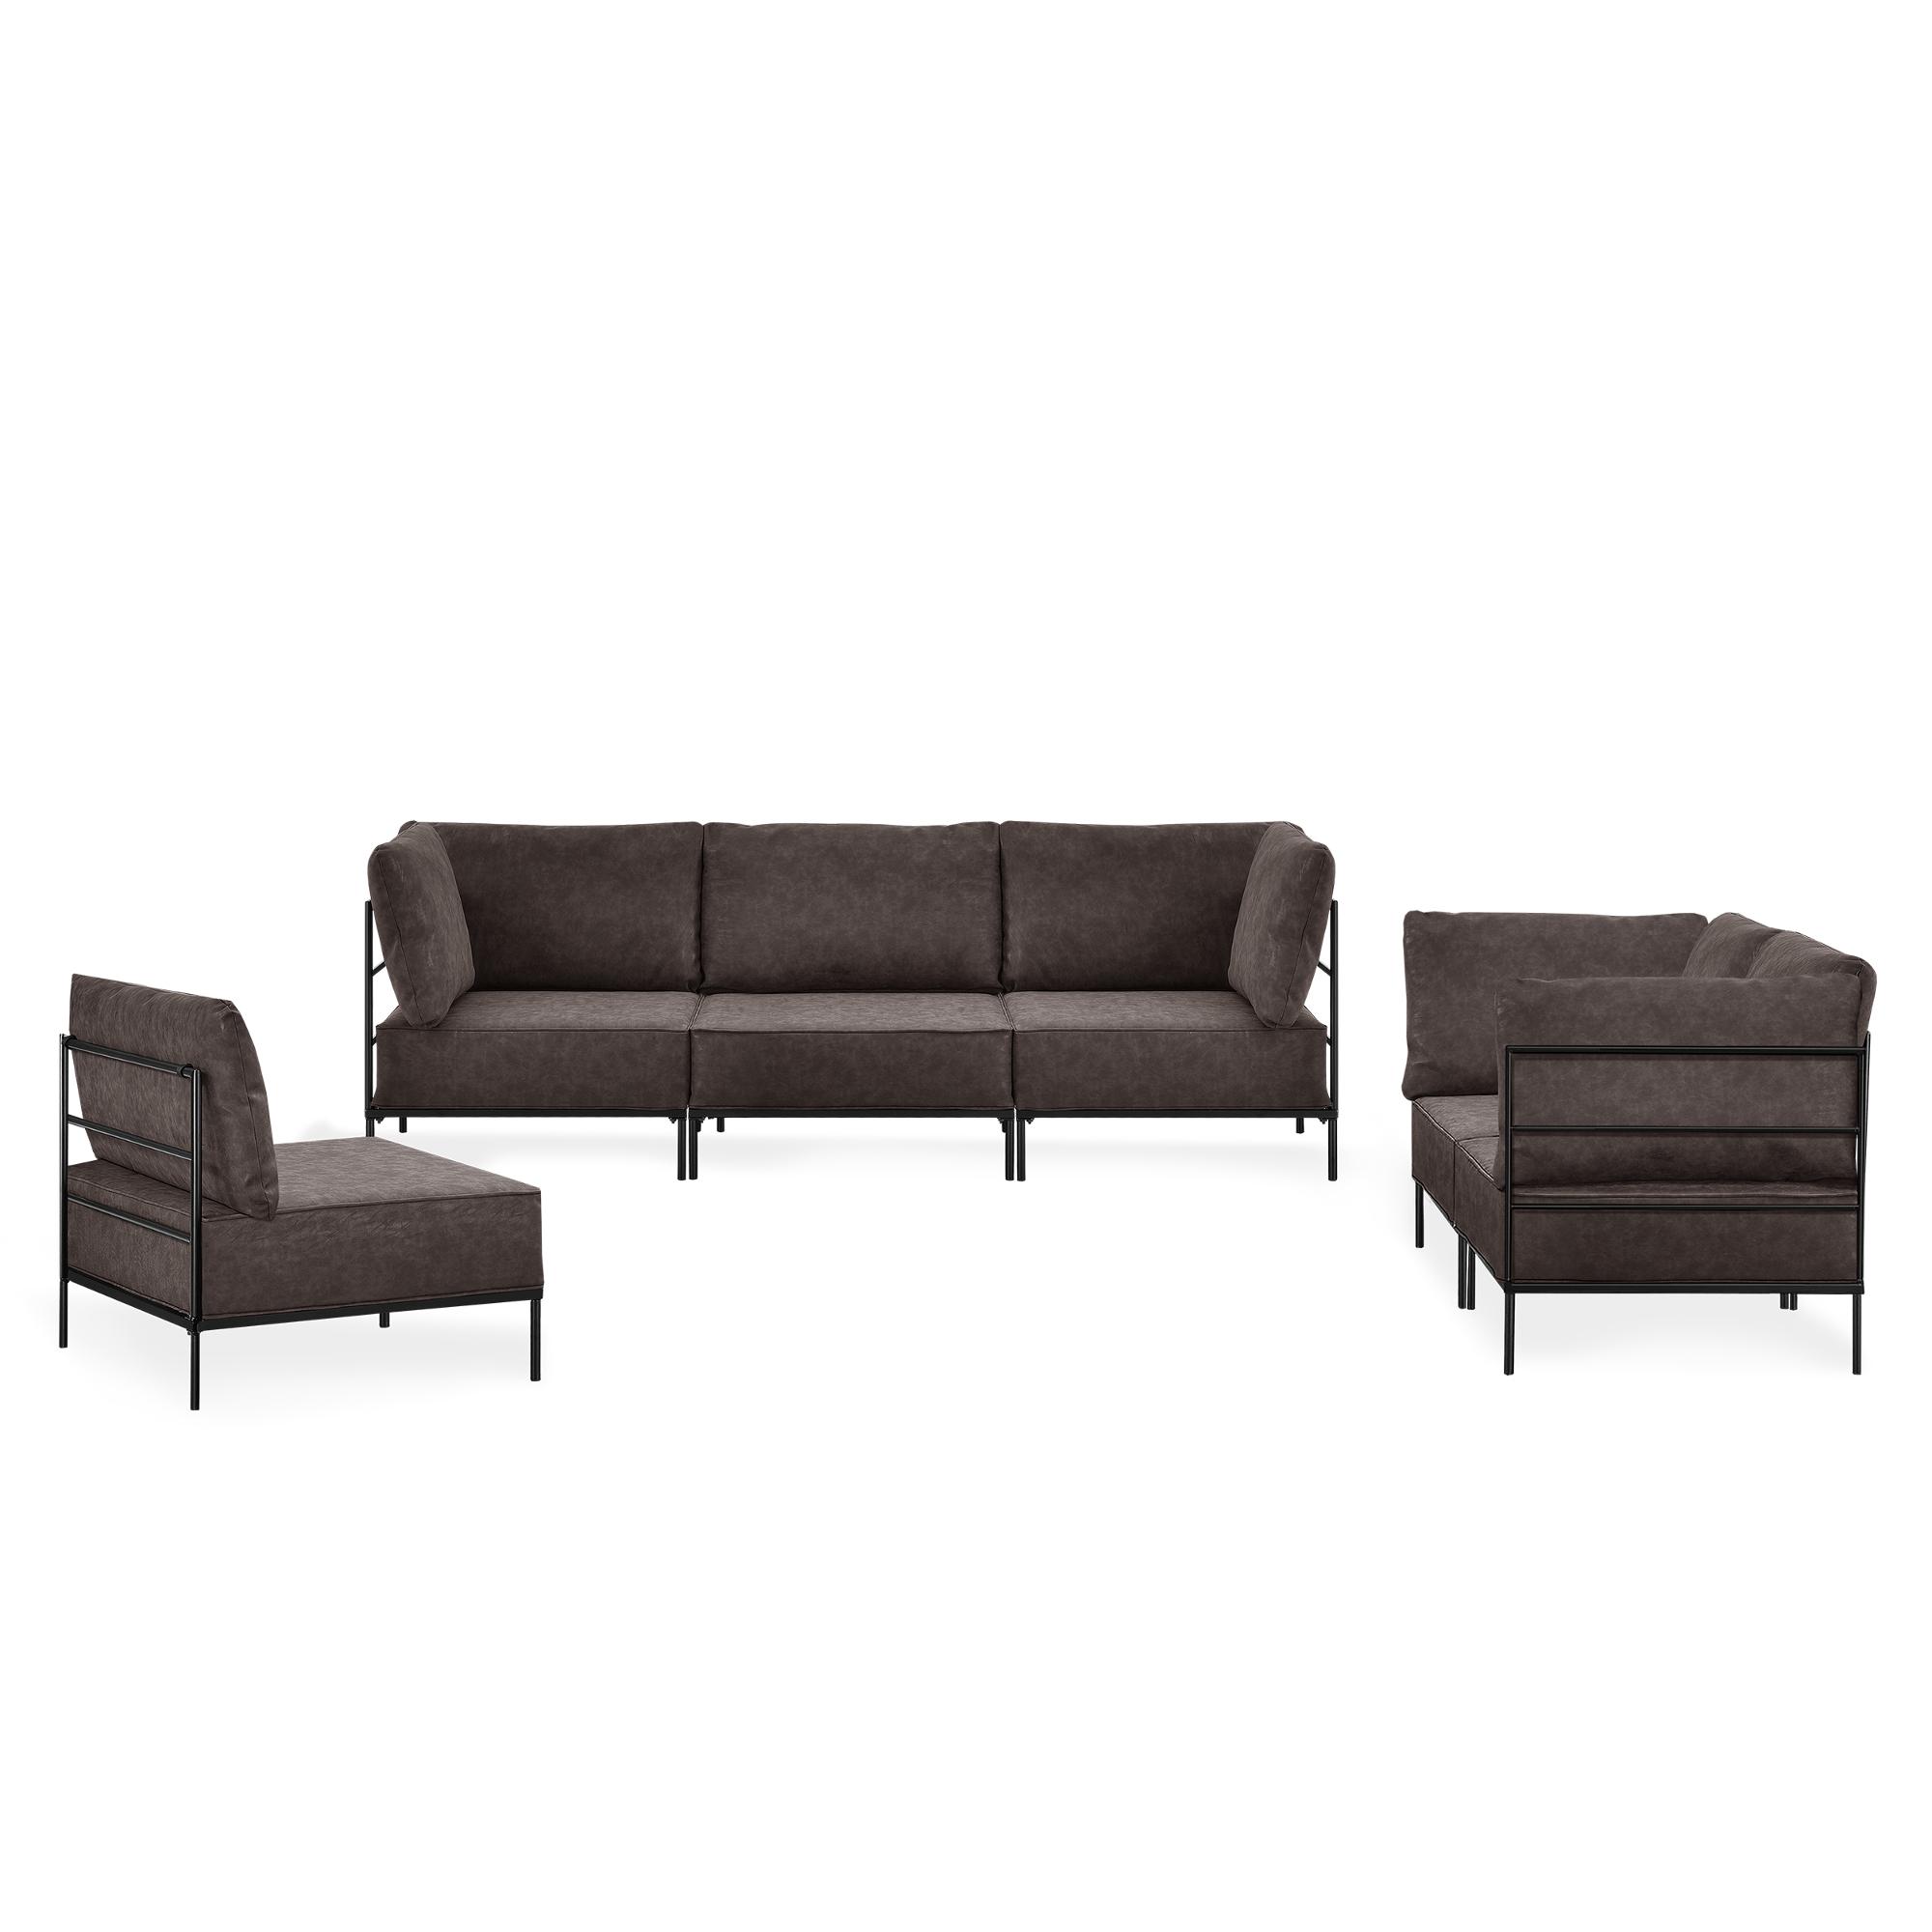 sofa couch sessel polstergarnitur. Black Bedroom Furniture Sets. Home Design Ideas